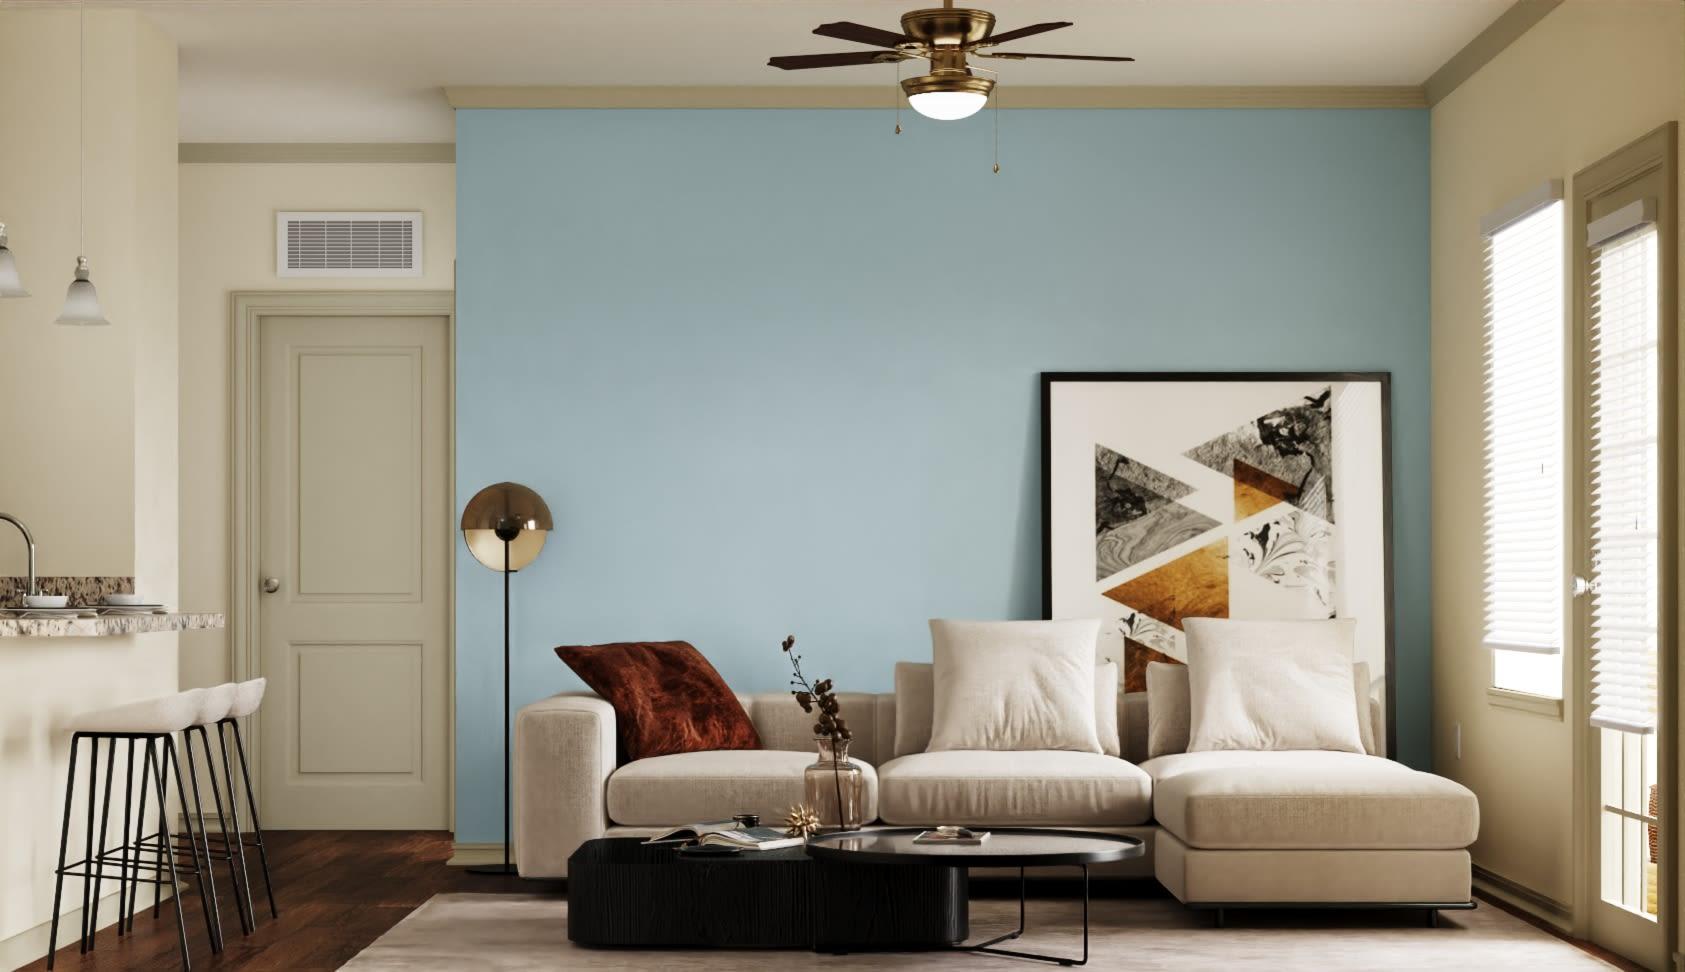 View virtual tour for a 1 bedroom 1 bathroom apartment at Pecan Springs Apartments in San Antonio, Texas